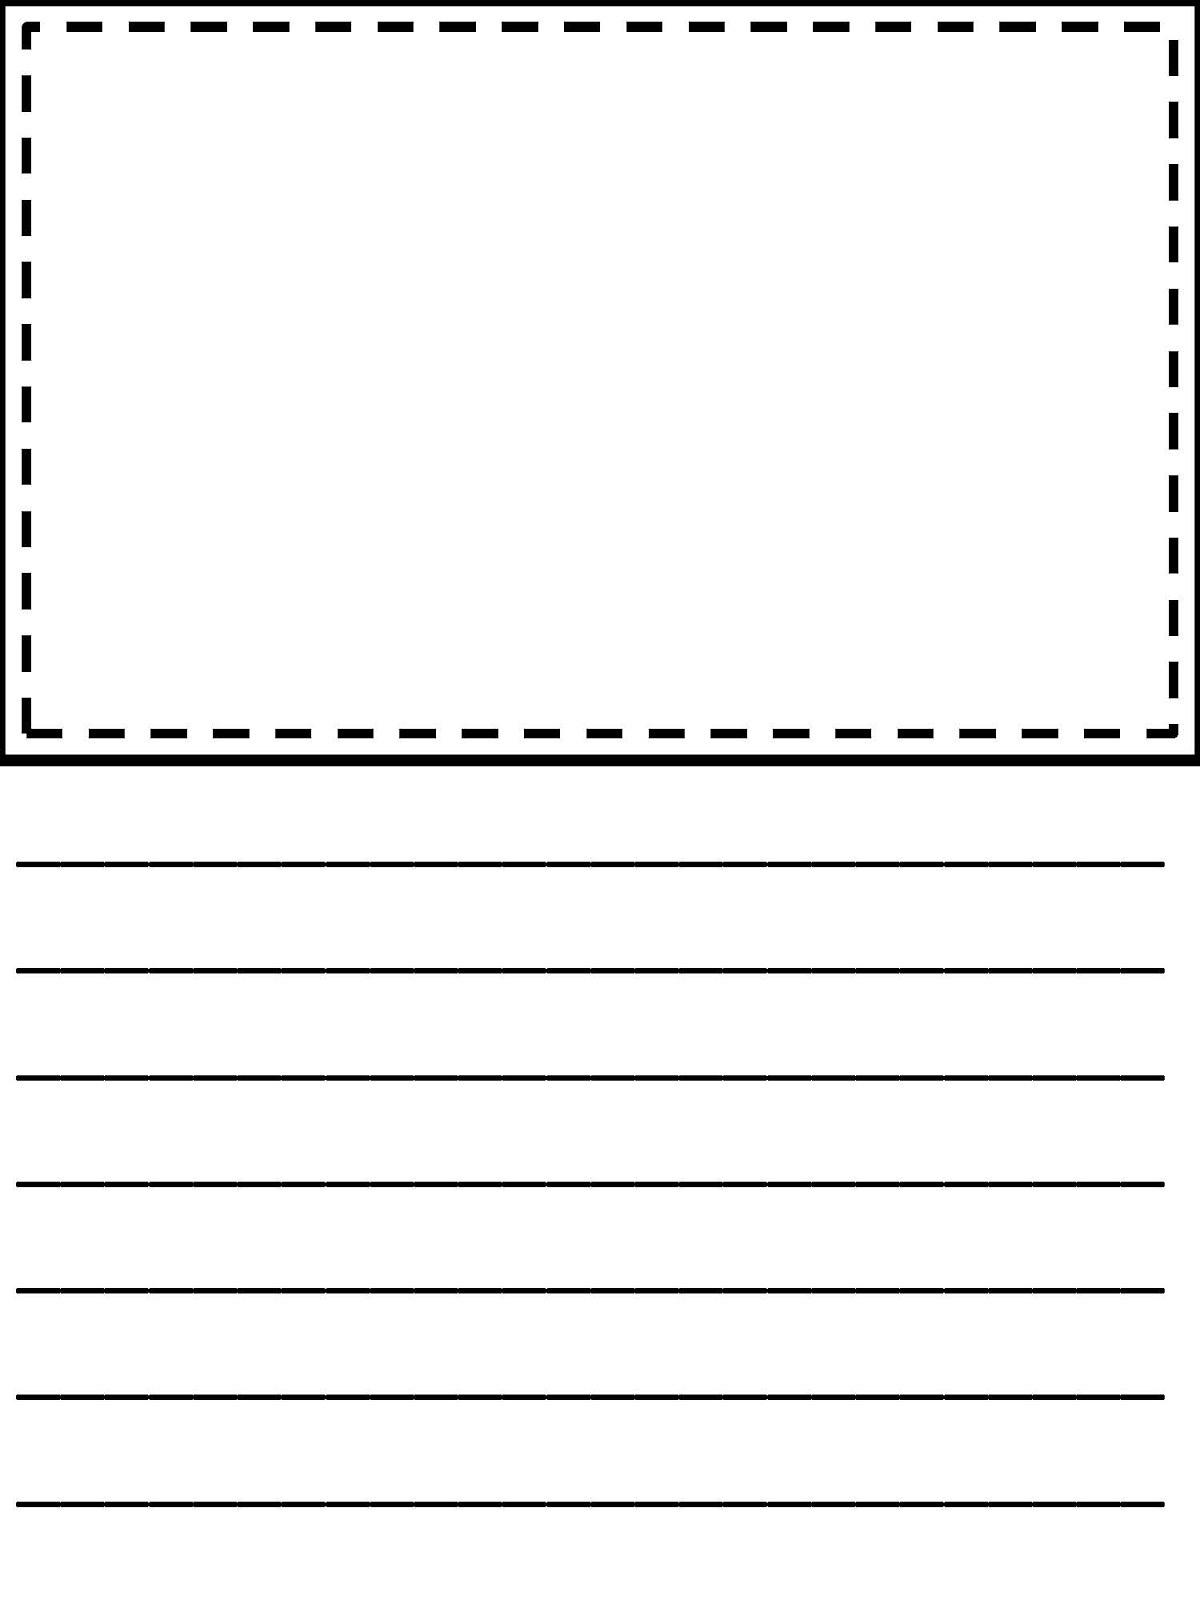 Third Grade Writing Paper   Homeshealth Handwriting Template - Free Printable Handwriting Paper